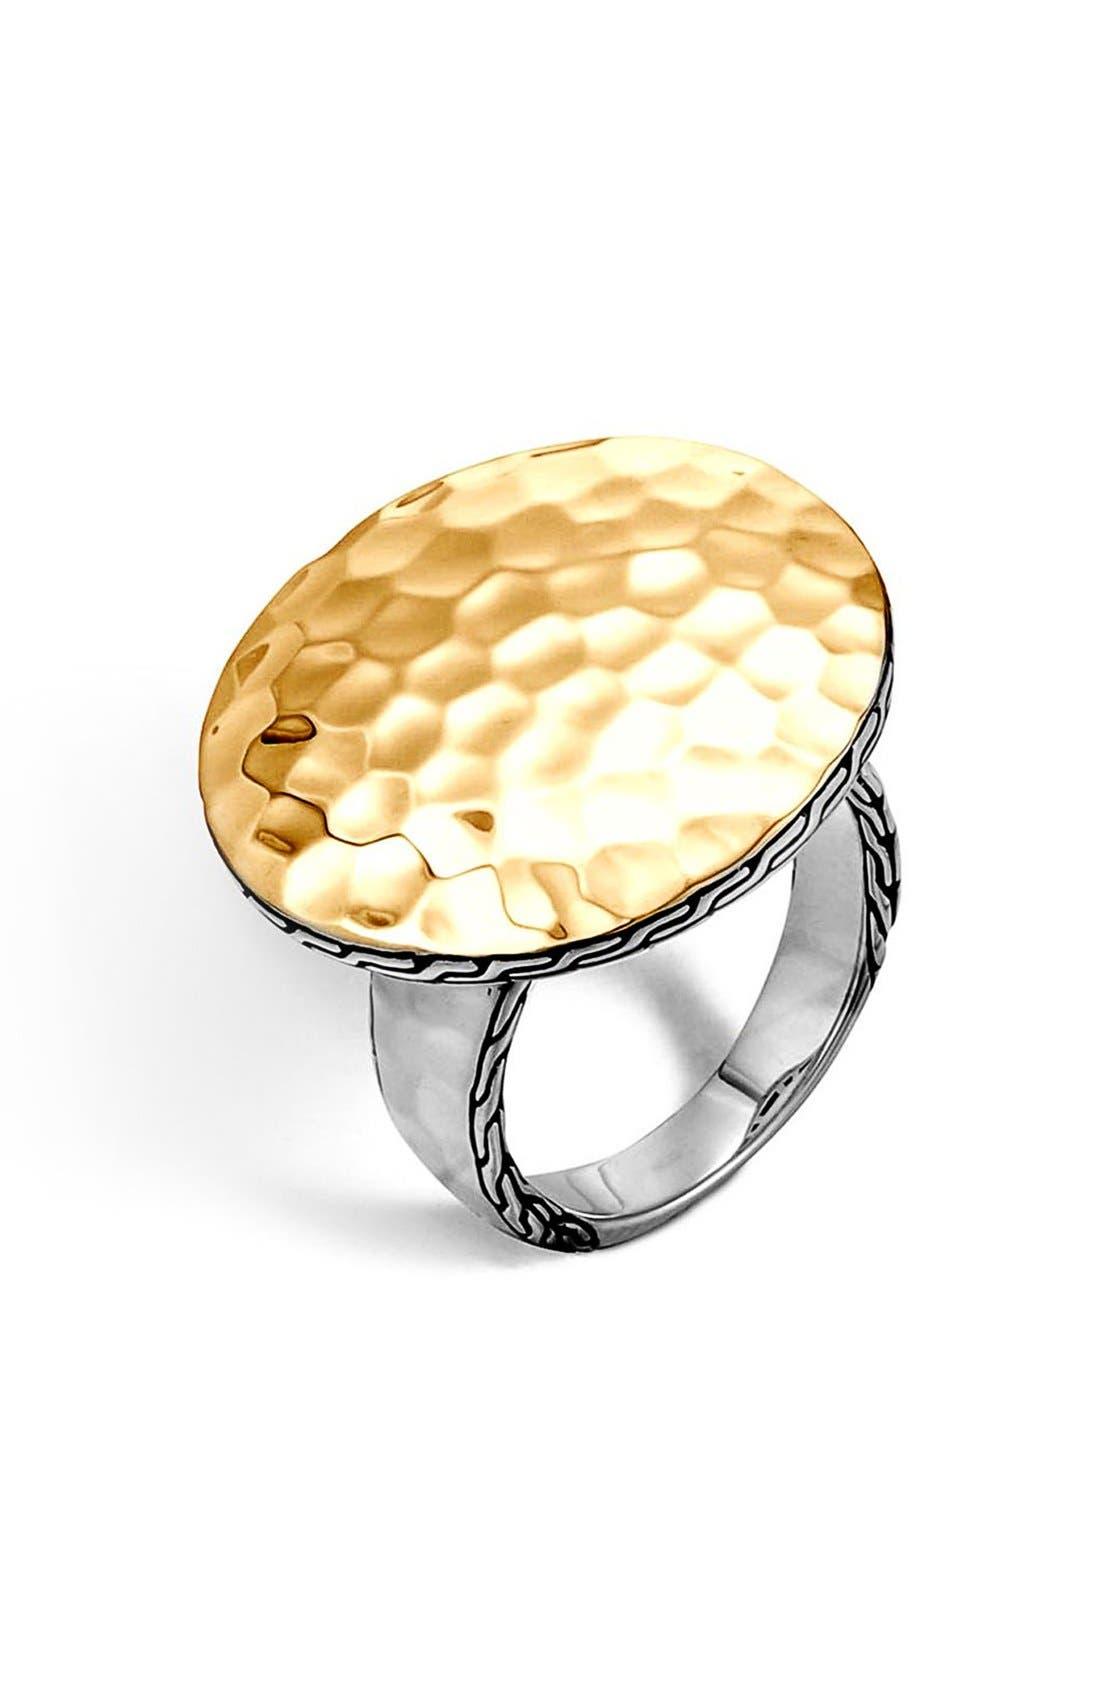 Alternate Image 1 Selected - John Hardy 'Dot' Round Ring